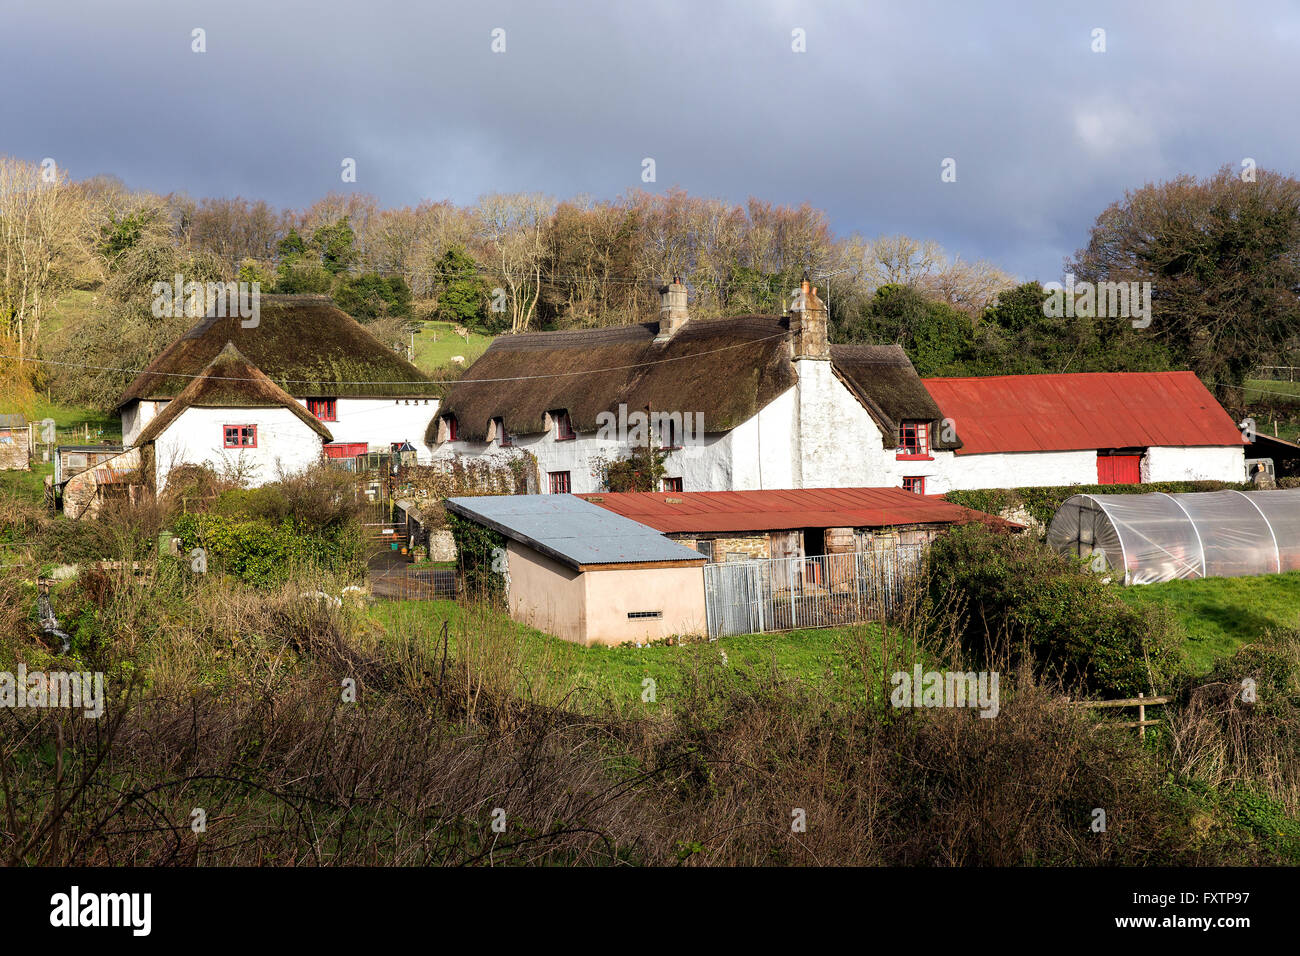 Thatched Cottage And Farm Complex In Dartmoor National Park Devon Englandcob Thatchvernacularleaden Skiesfarmingbarns